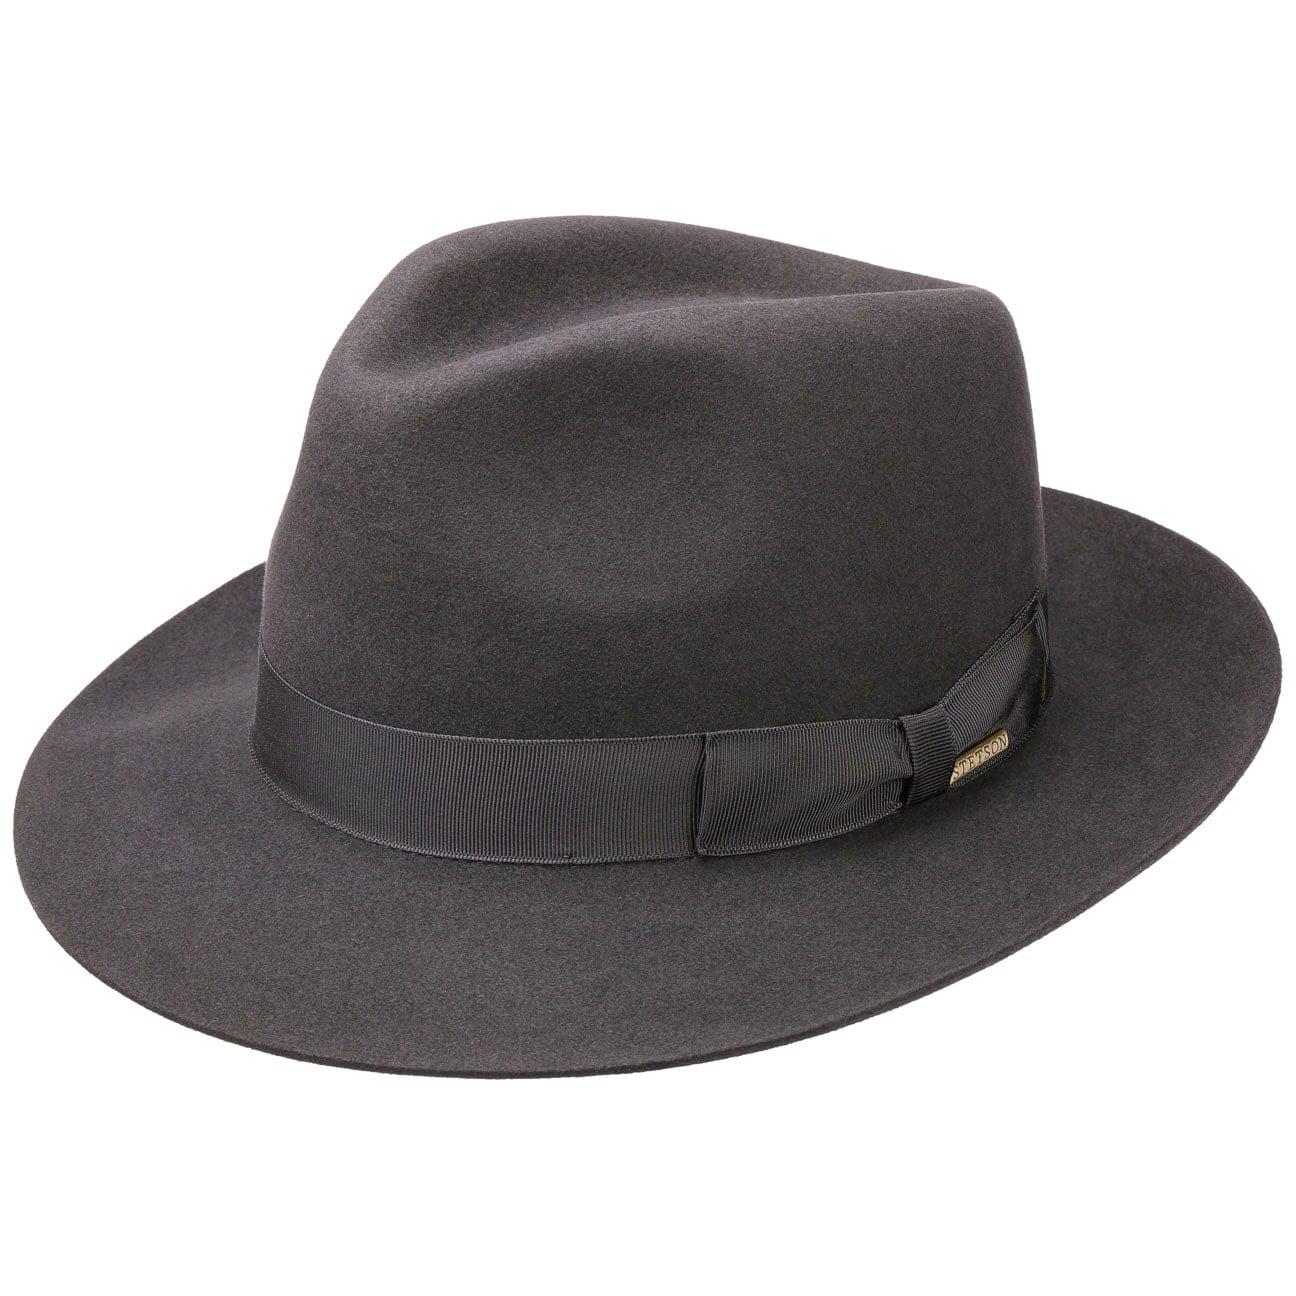 chapeau-penn-bogart-by-stetson-chapeau-bogart